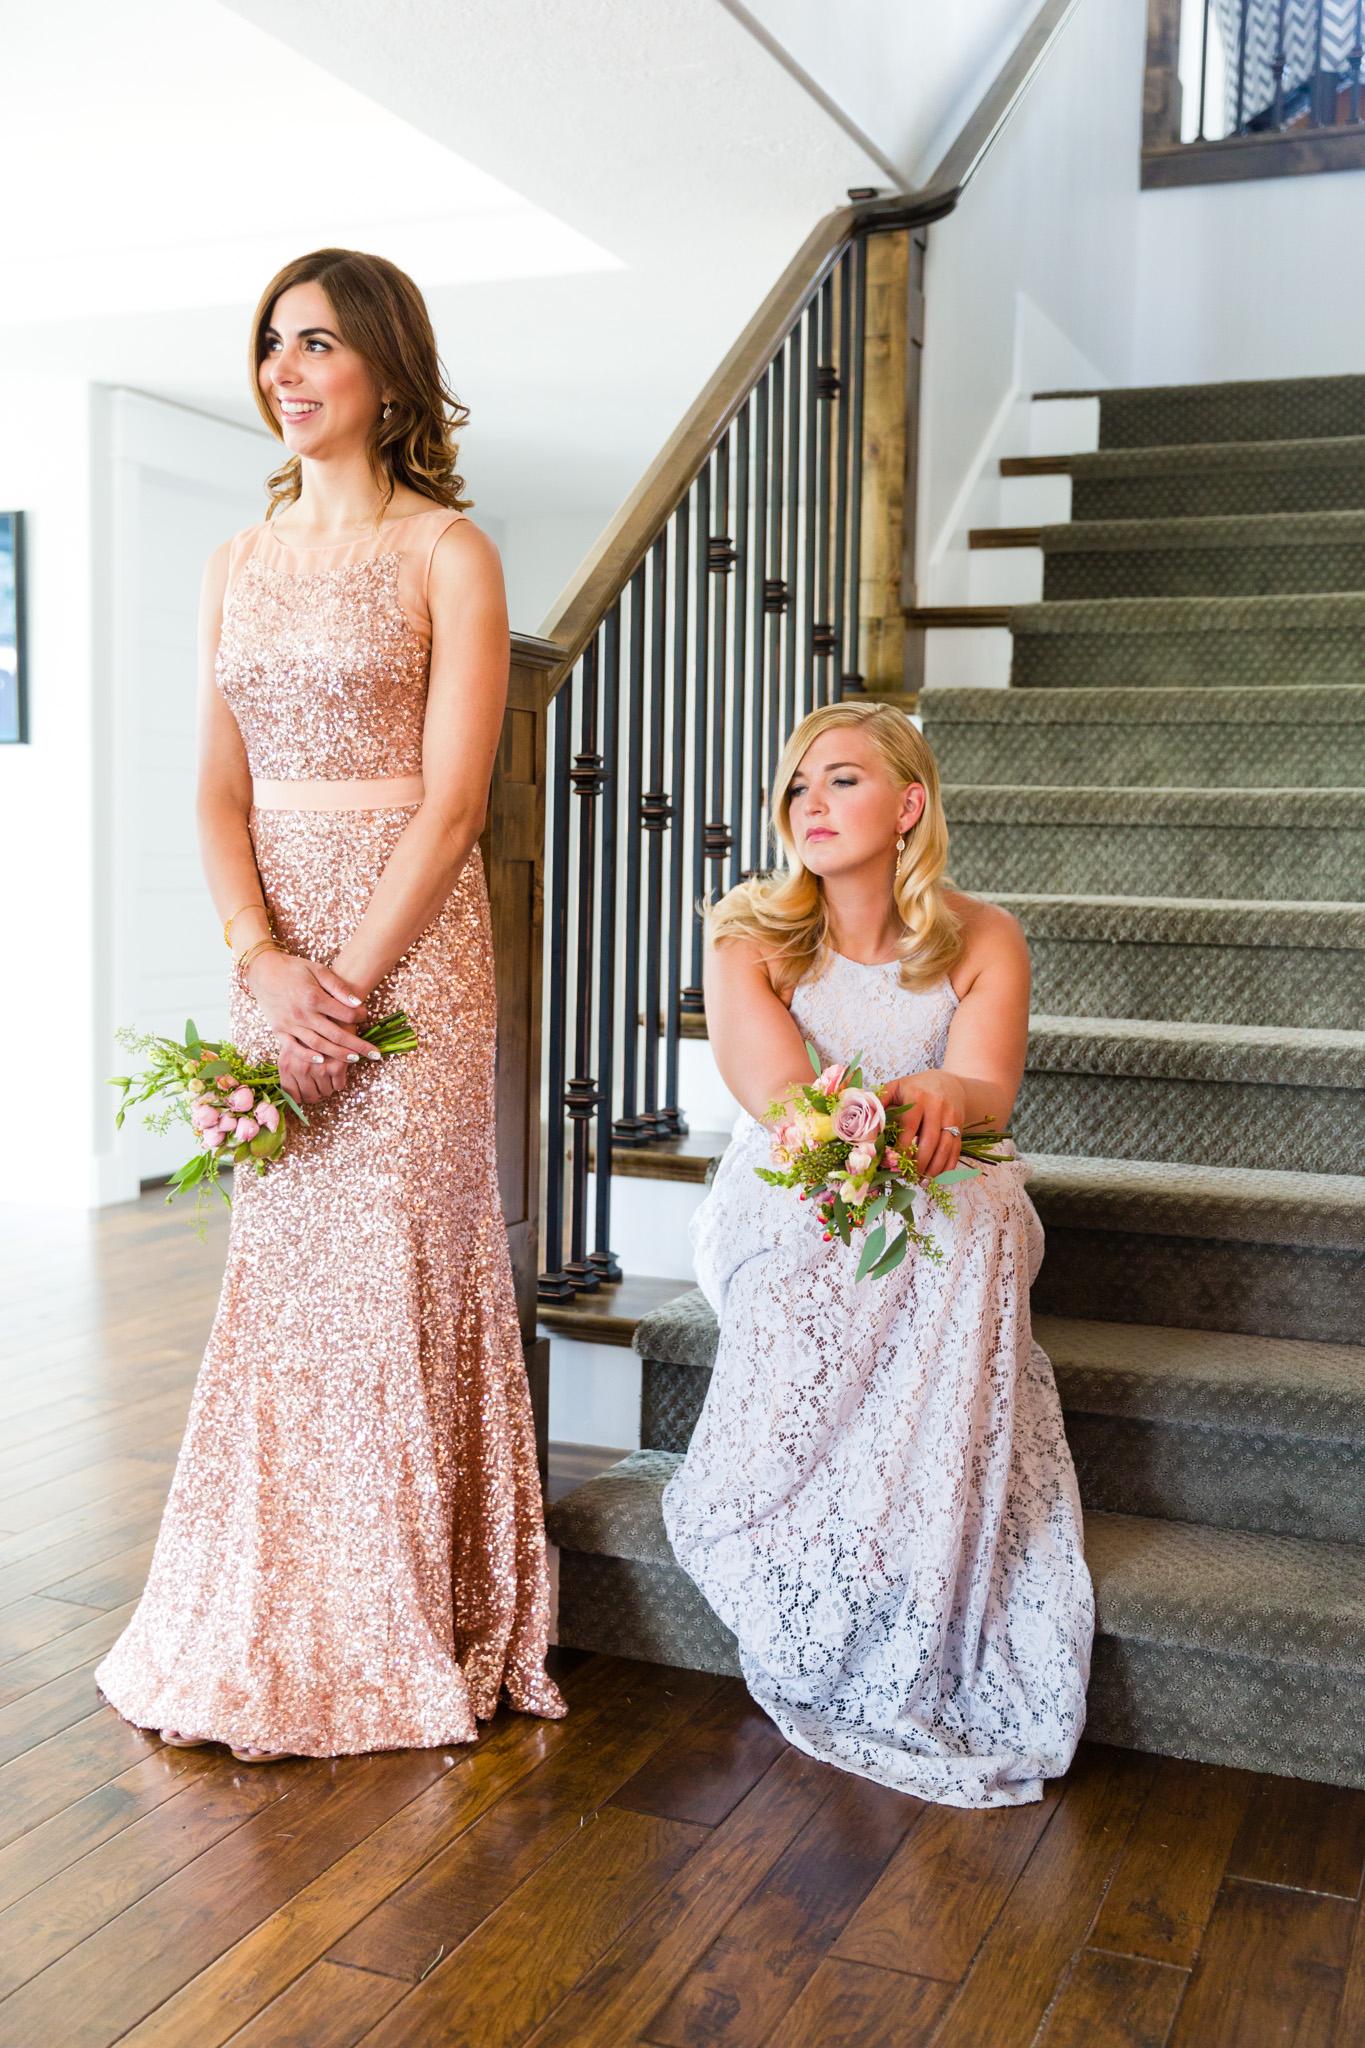 Bridesmaids or groomsmaids